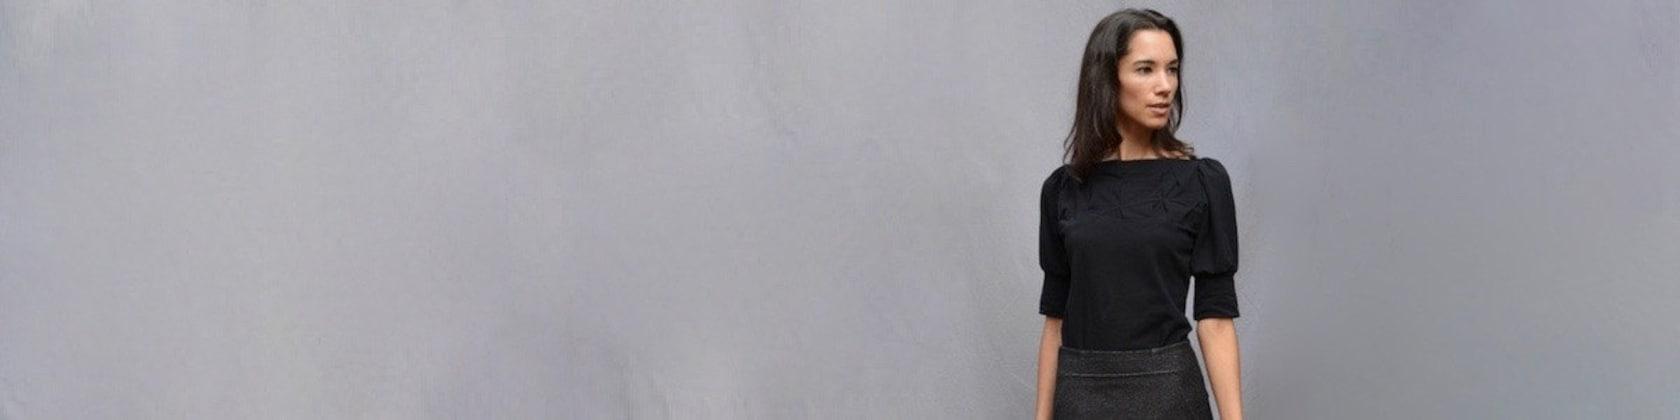 Handmade Women\'s Clothing Modern by outofline on Etsy